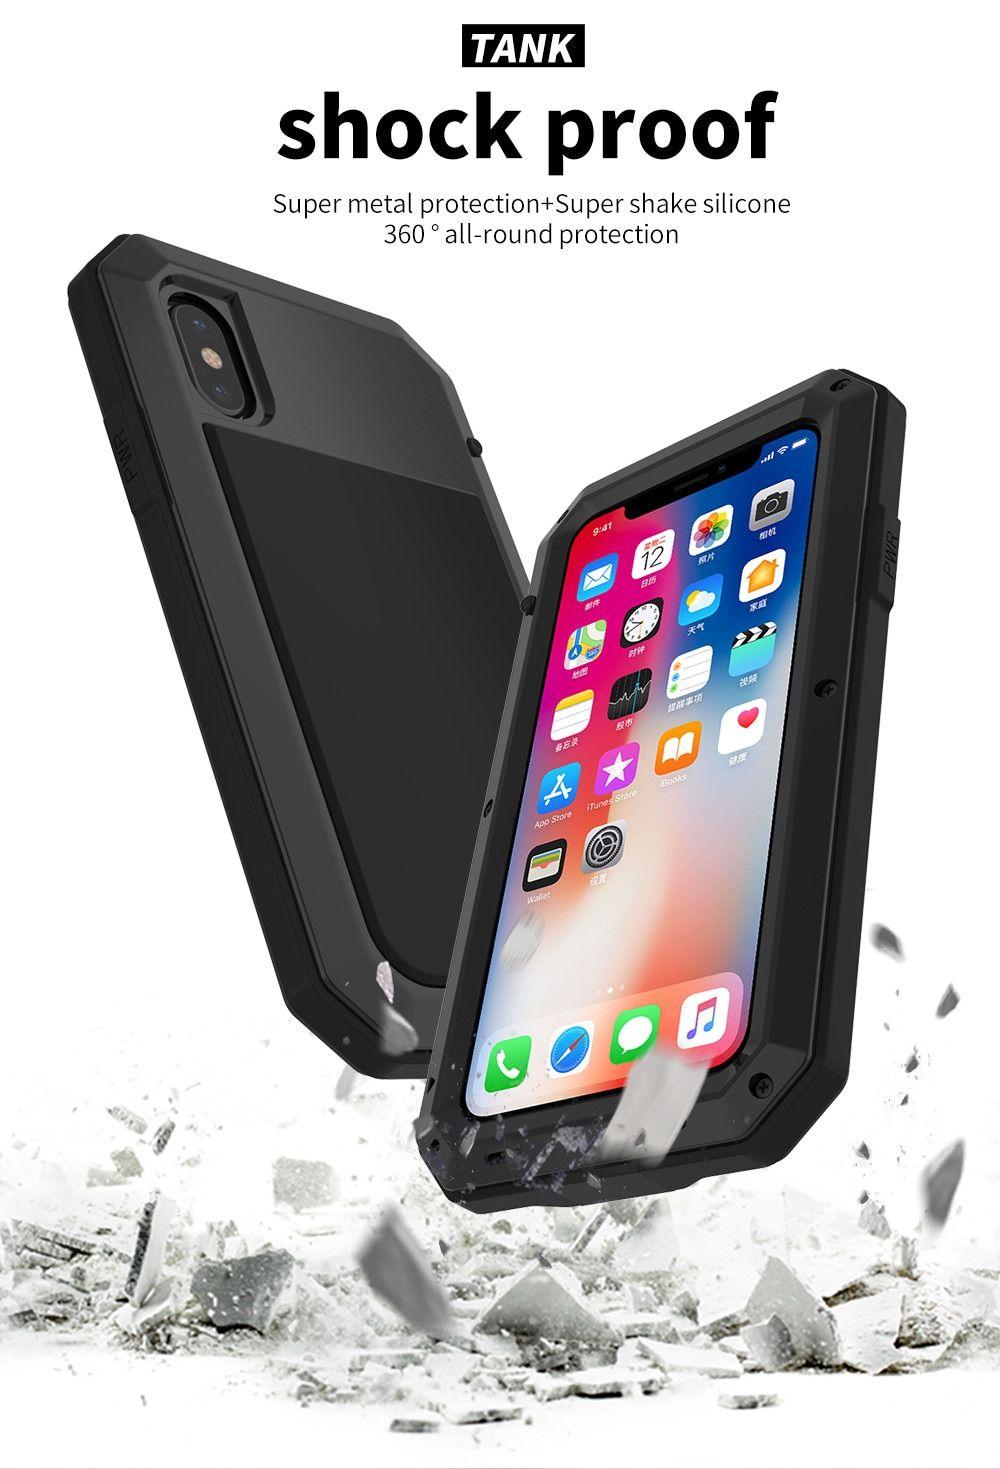 Heavy duty protection doom armor metal aluminum phone case